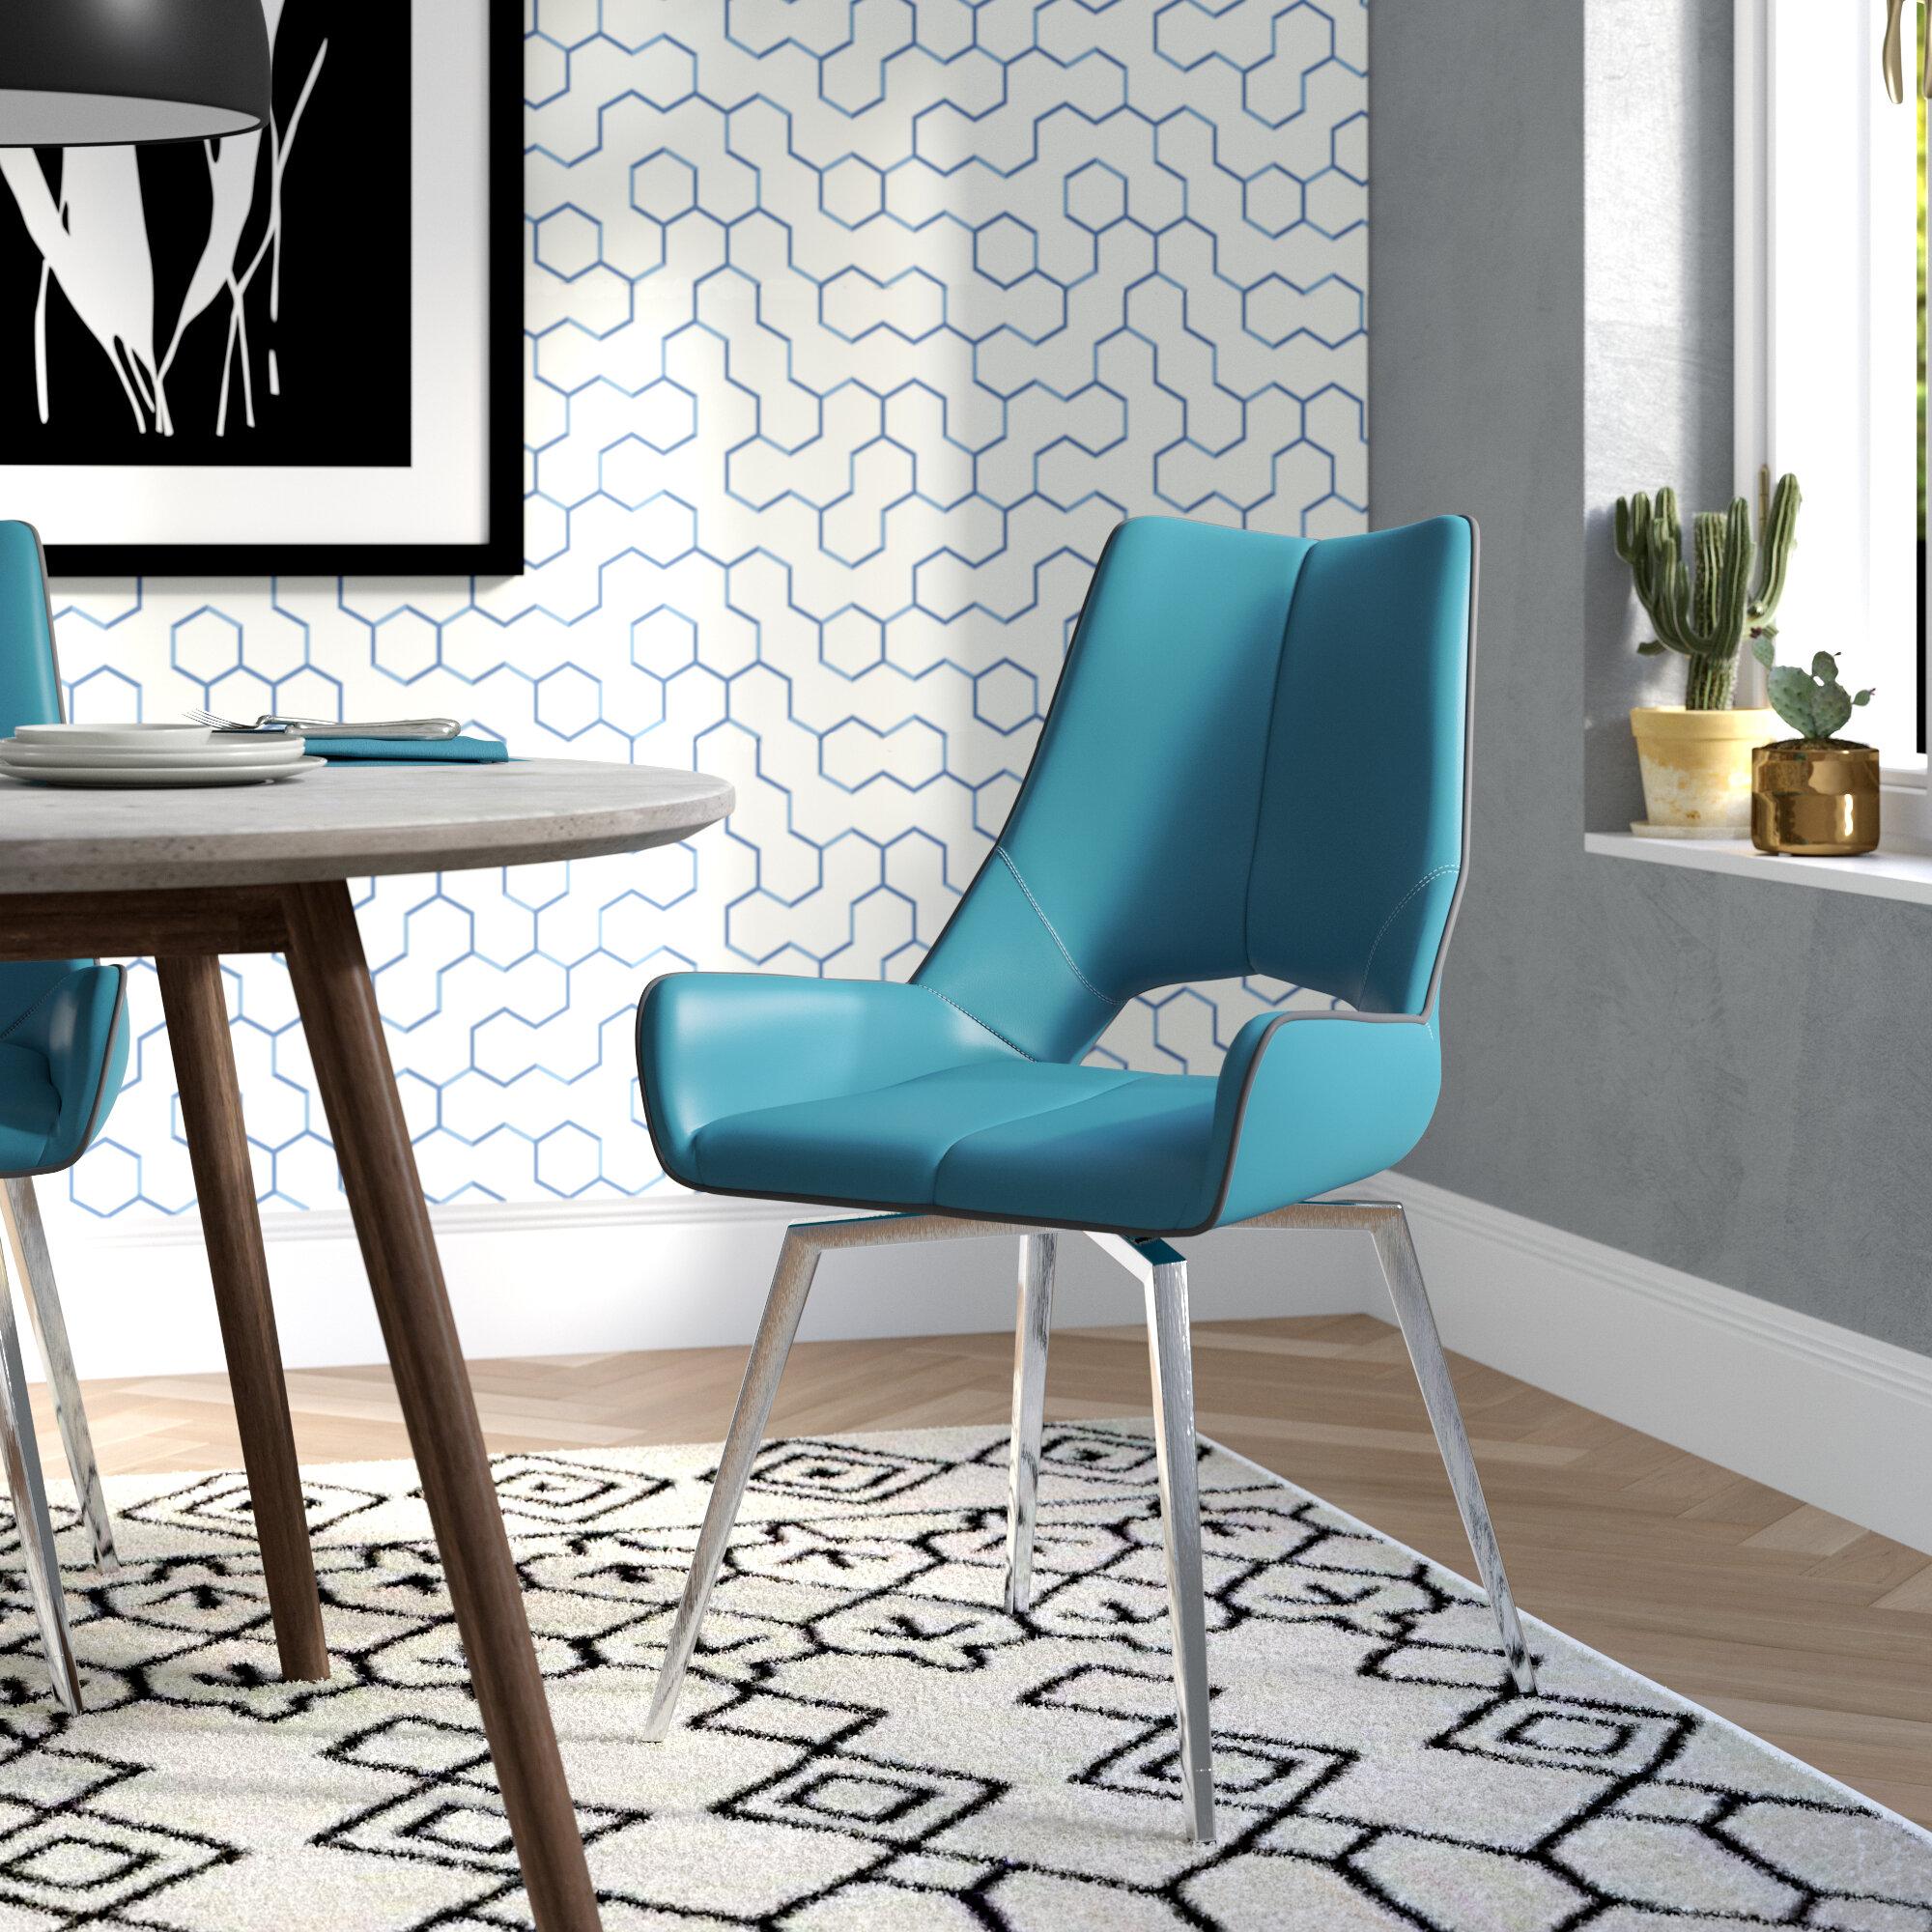 Brayden Studio Kimbell Bucket Upholstered Dining Chair Reviews Wayfair